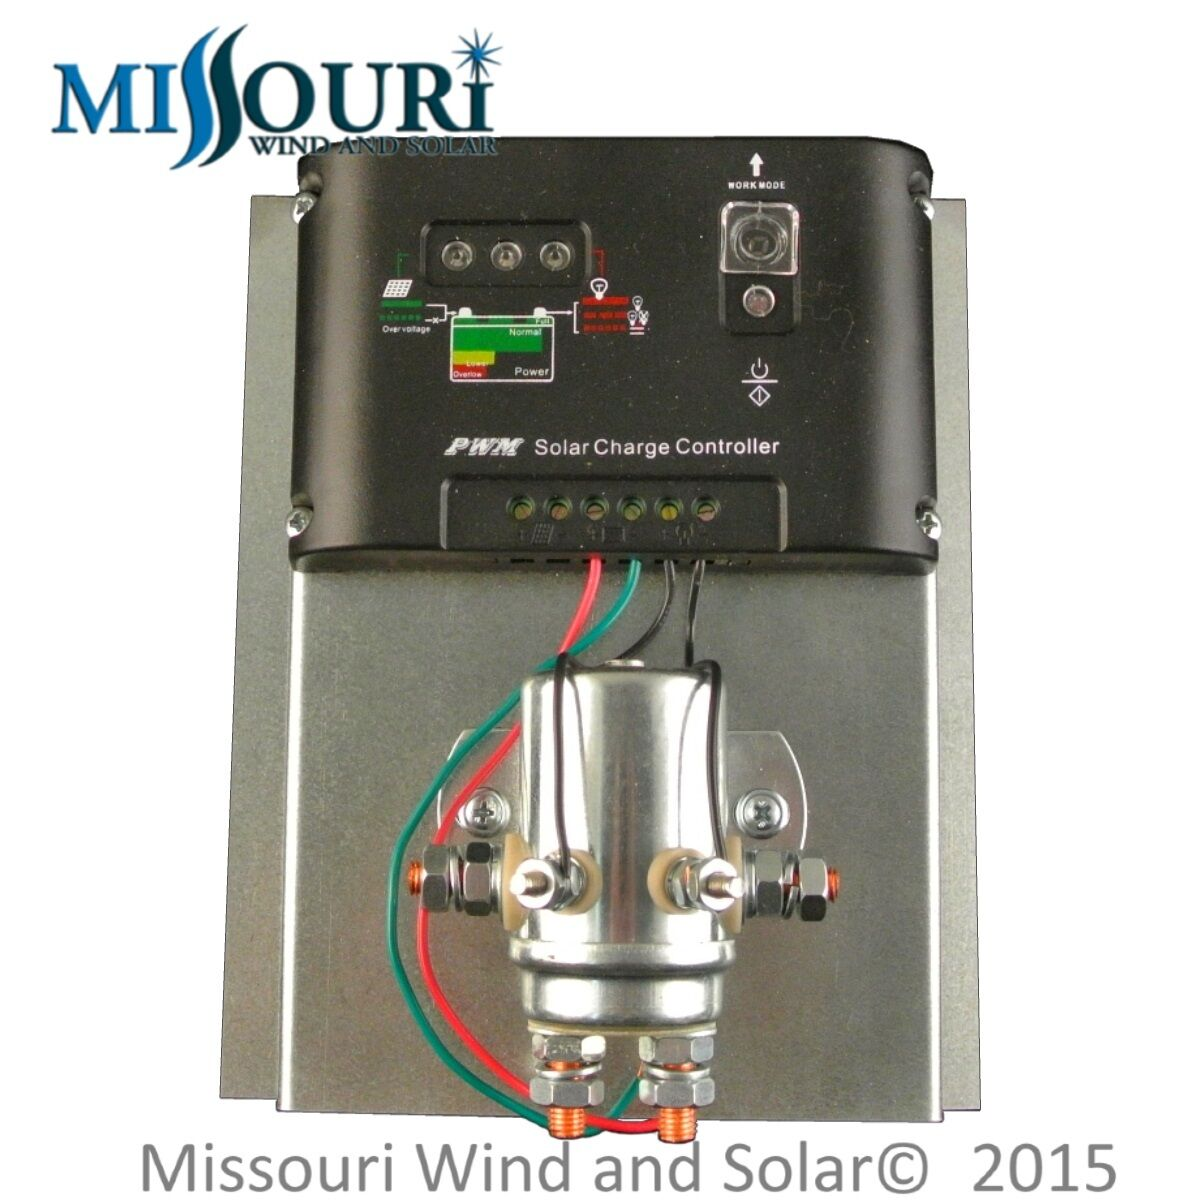 400 watt wind turbine 12 volt 400 amp 10 000 watt charge controller for wind turbine solar panel pv